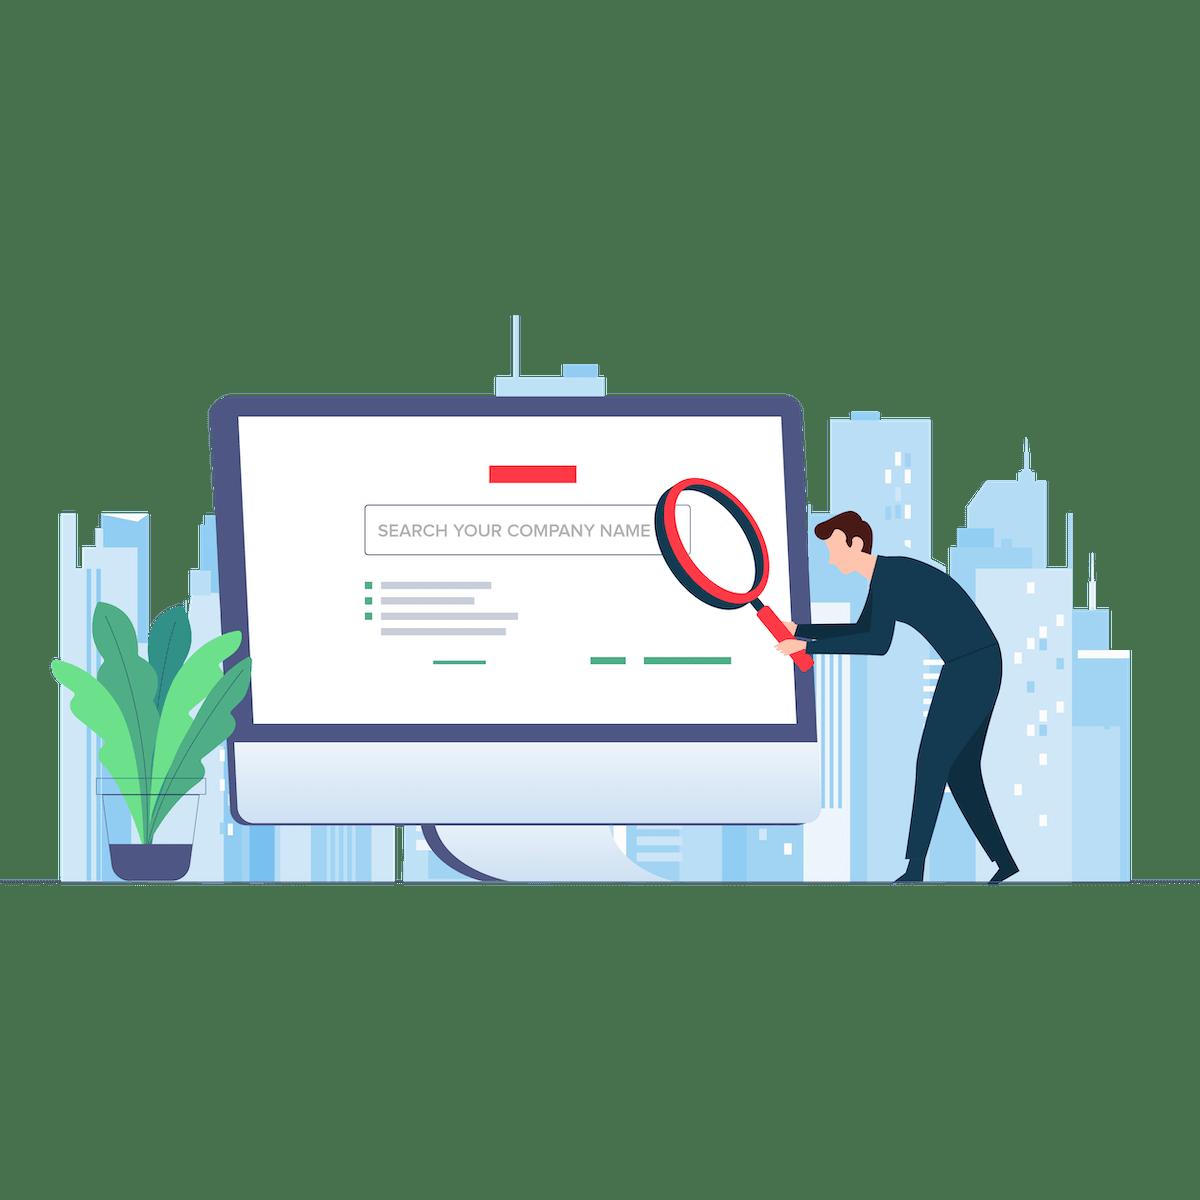 Company name search tool